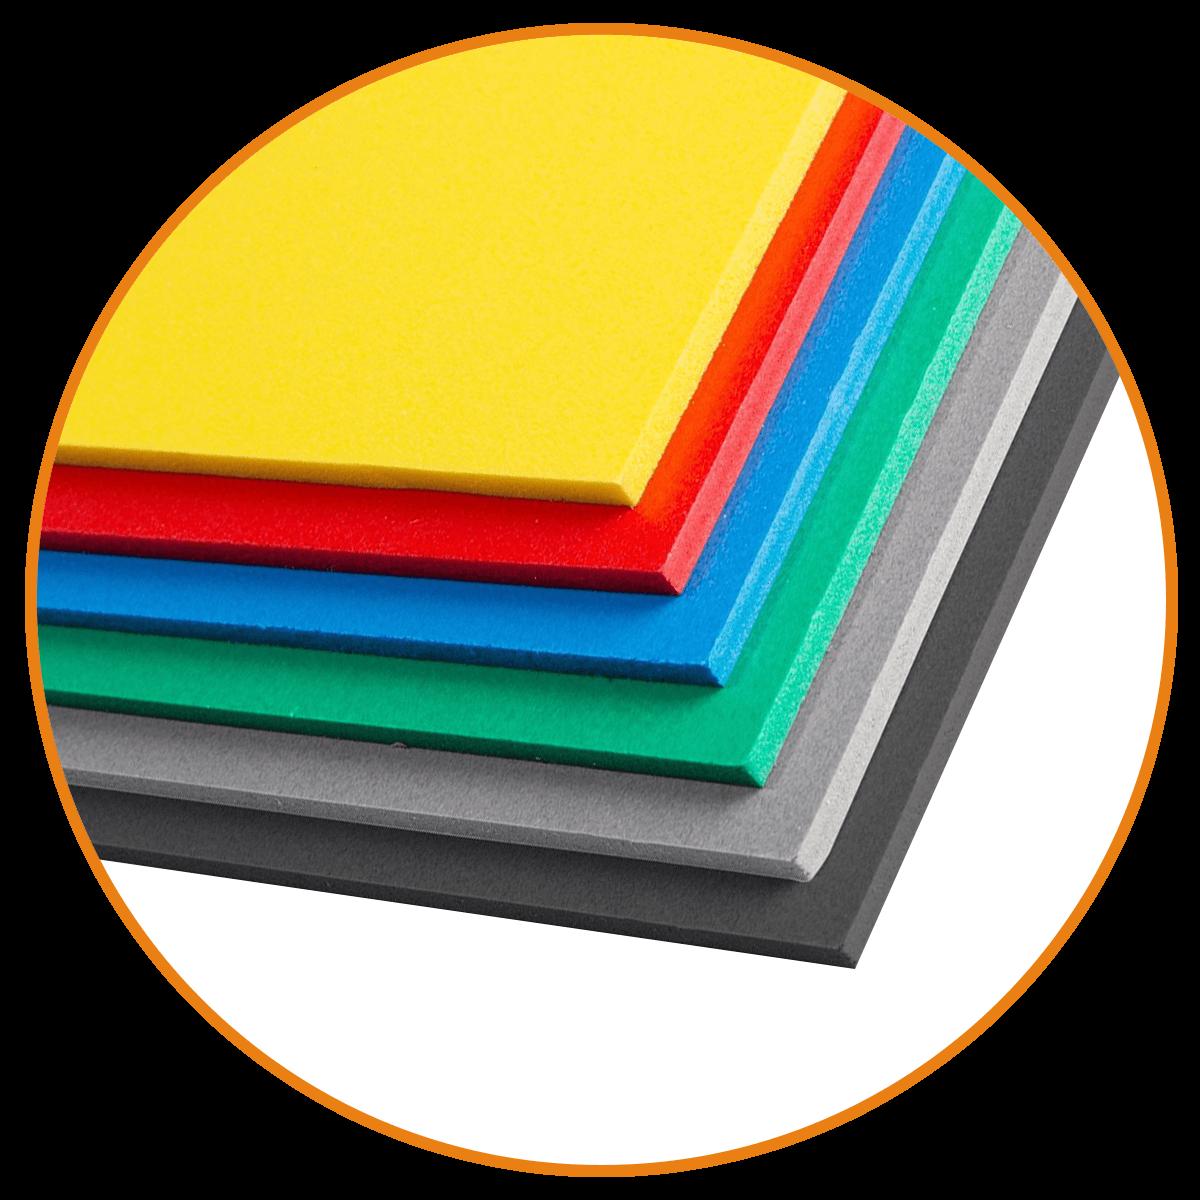 Materiales de maquetas - Chipboards, Mattboards y FoamboardsBasswoodNavajas y PortanavajasCutting MattsReglas y Tijeras